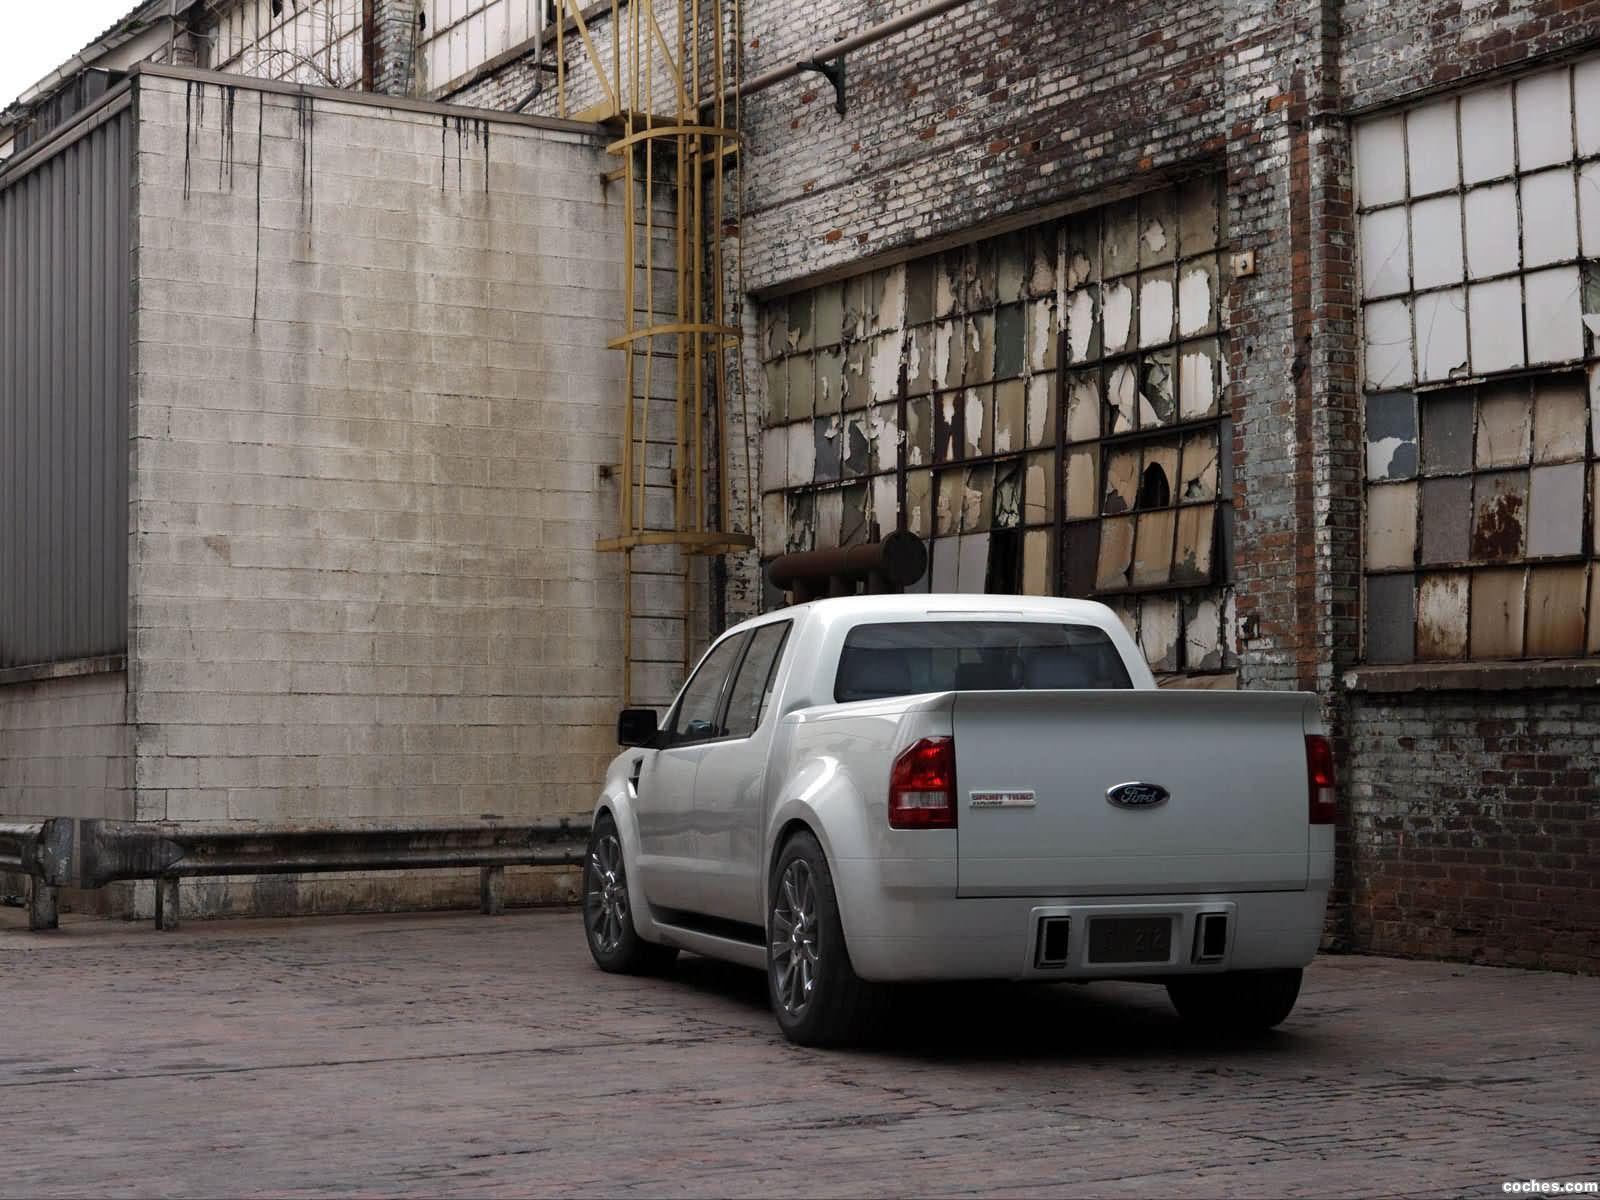 Foto 11 de Ford Sport Trac Concept 2004